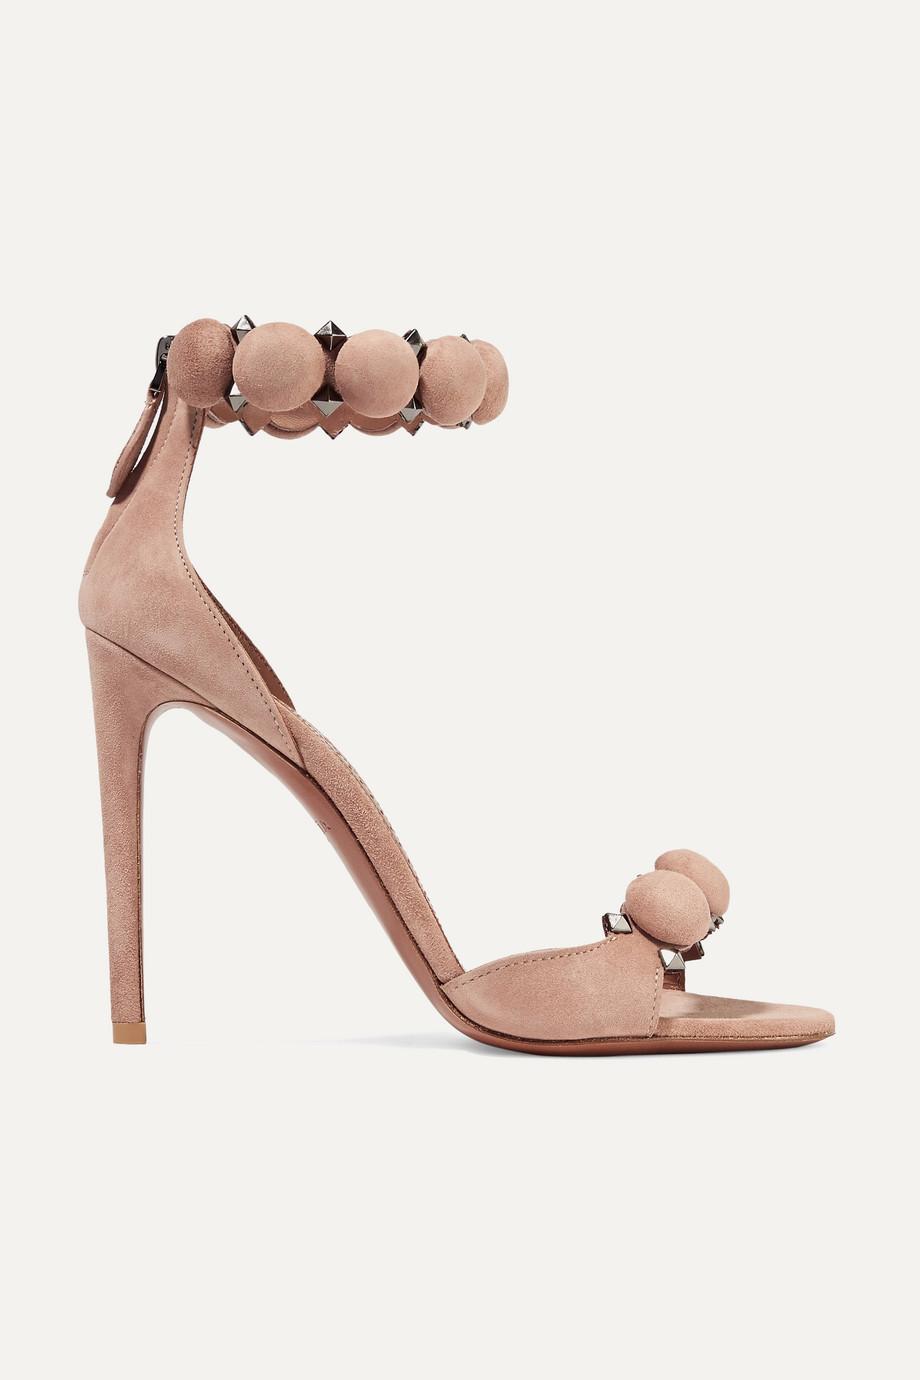 Alaïa Bombe 110 铆钉绒面革凉鞋